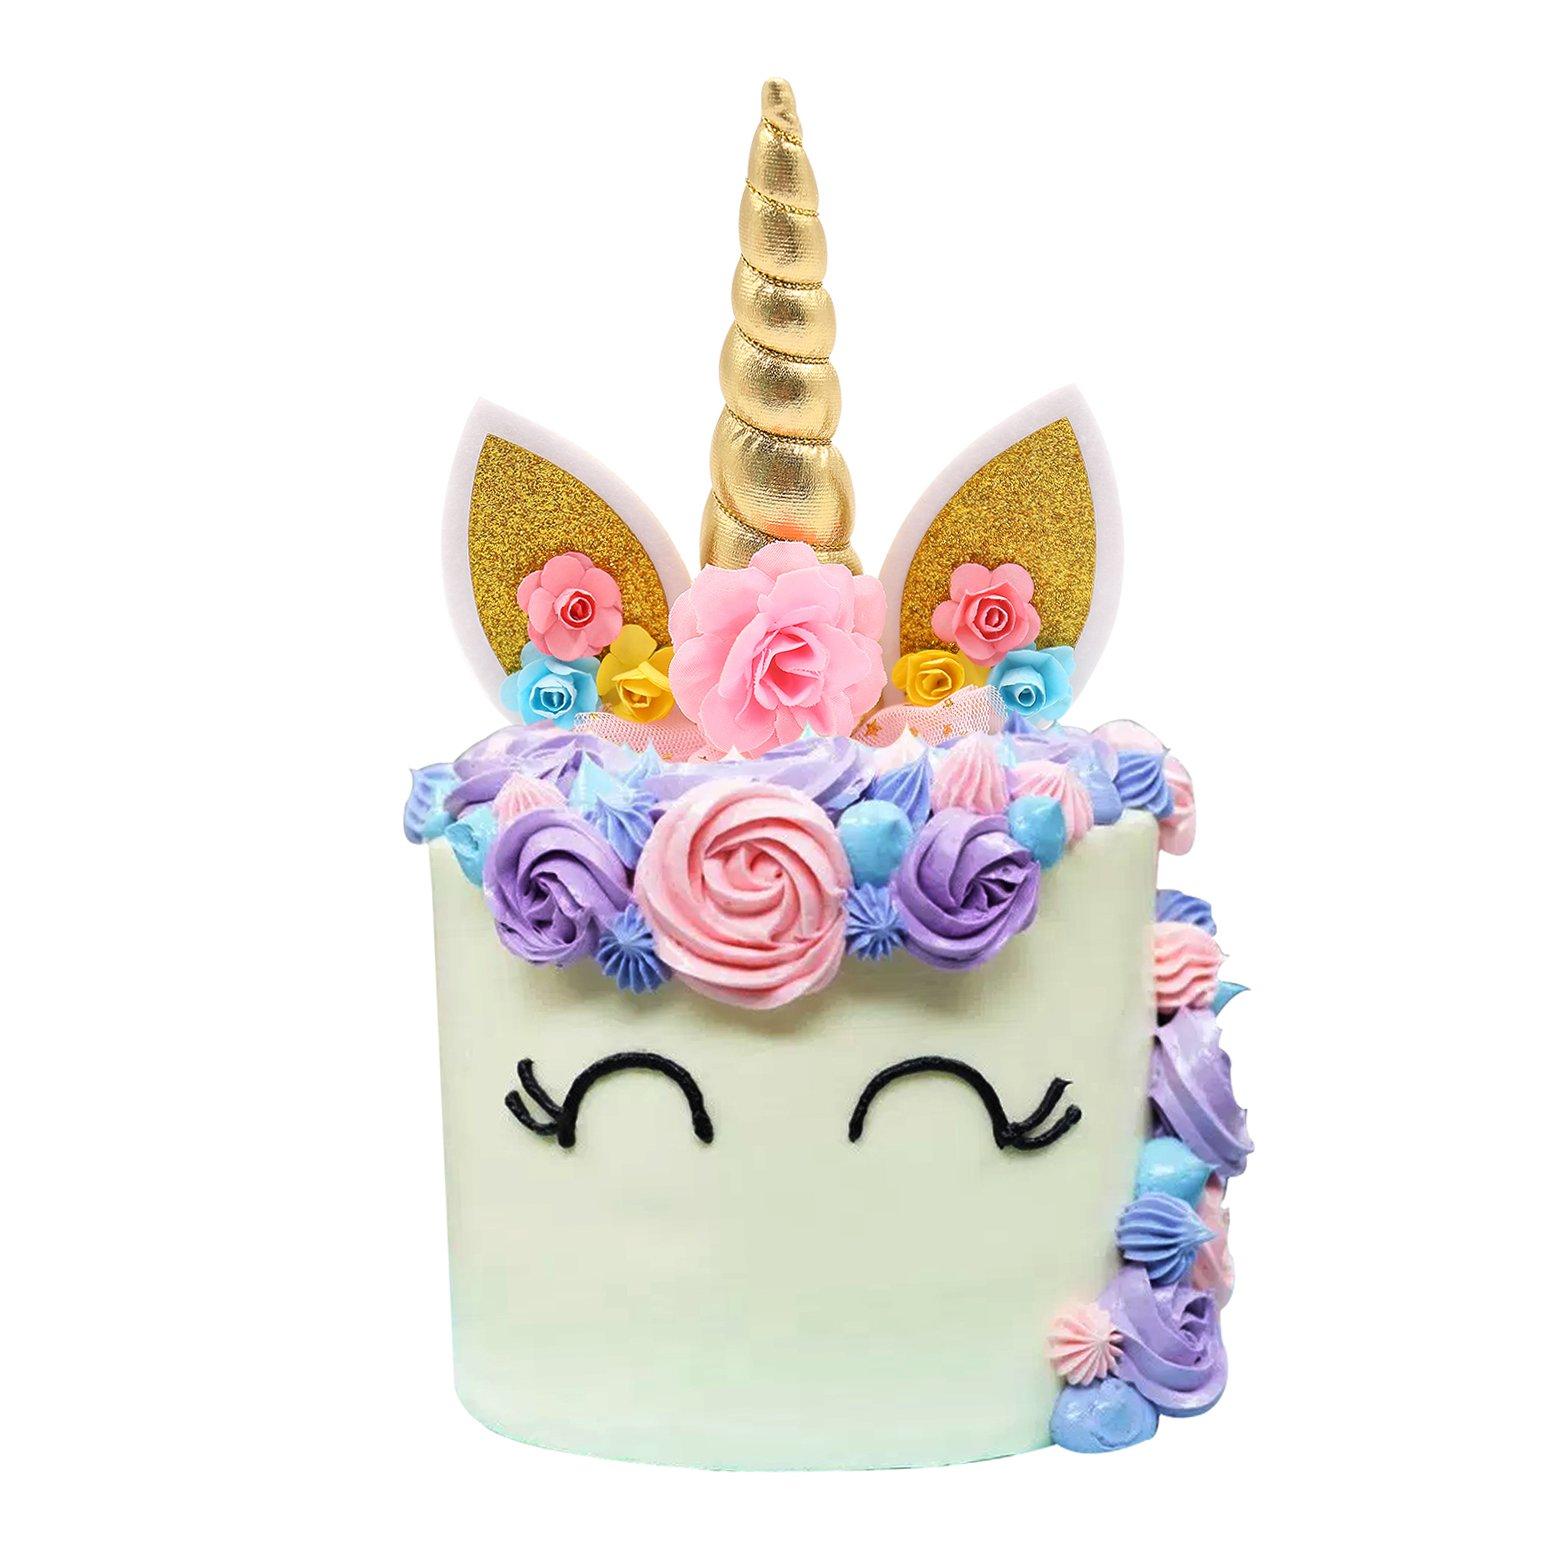 Amazon.com : GEORLD 24pcs Edible Unicorn Cupcake Toppers ...